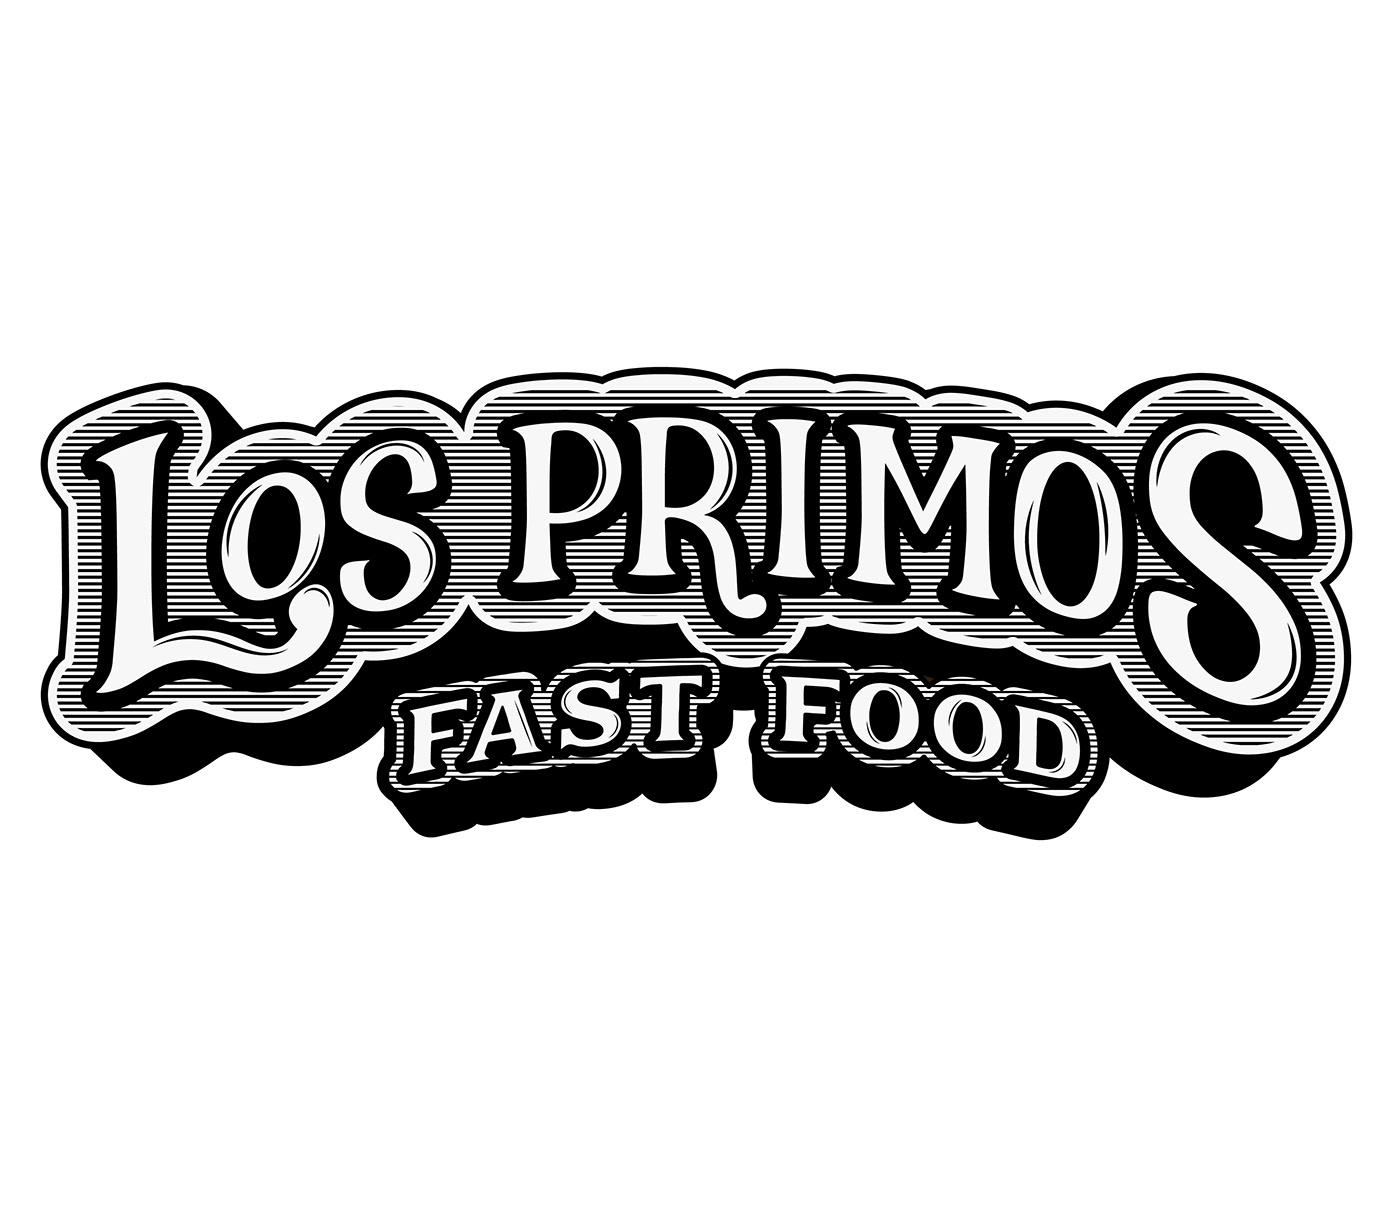 Fast Food Los Primos on Behance.